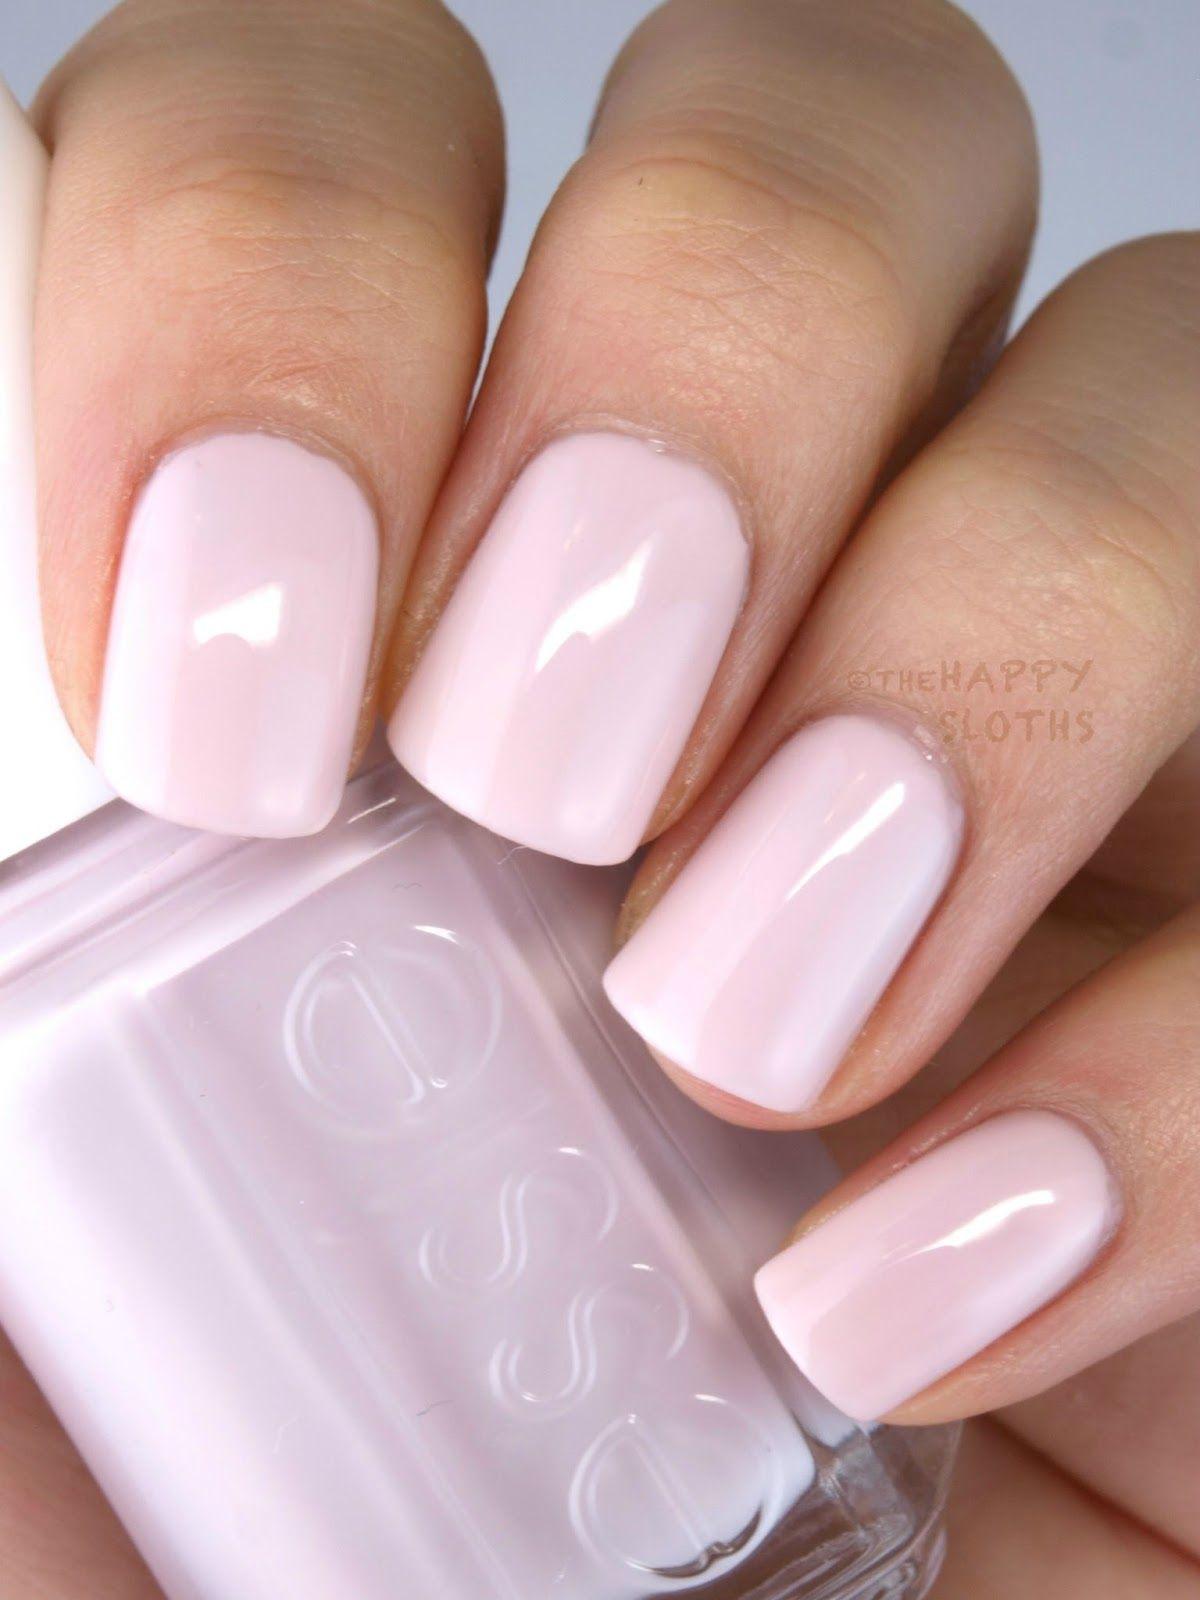 how to make matte nail polish with baby powder